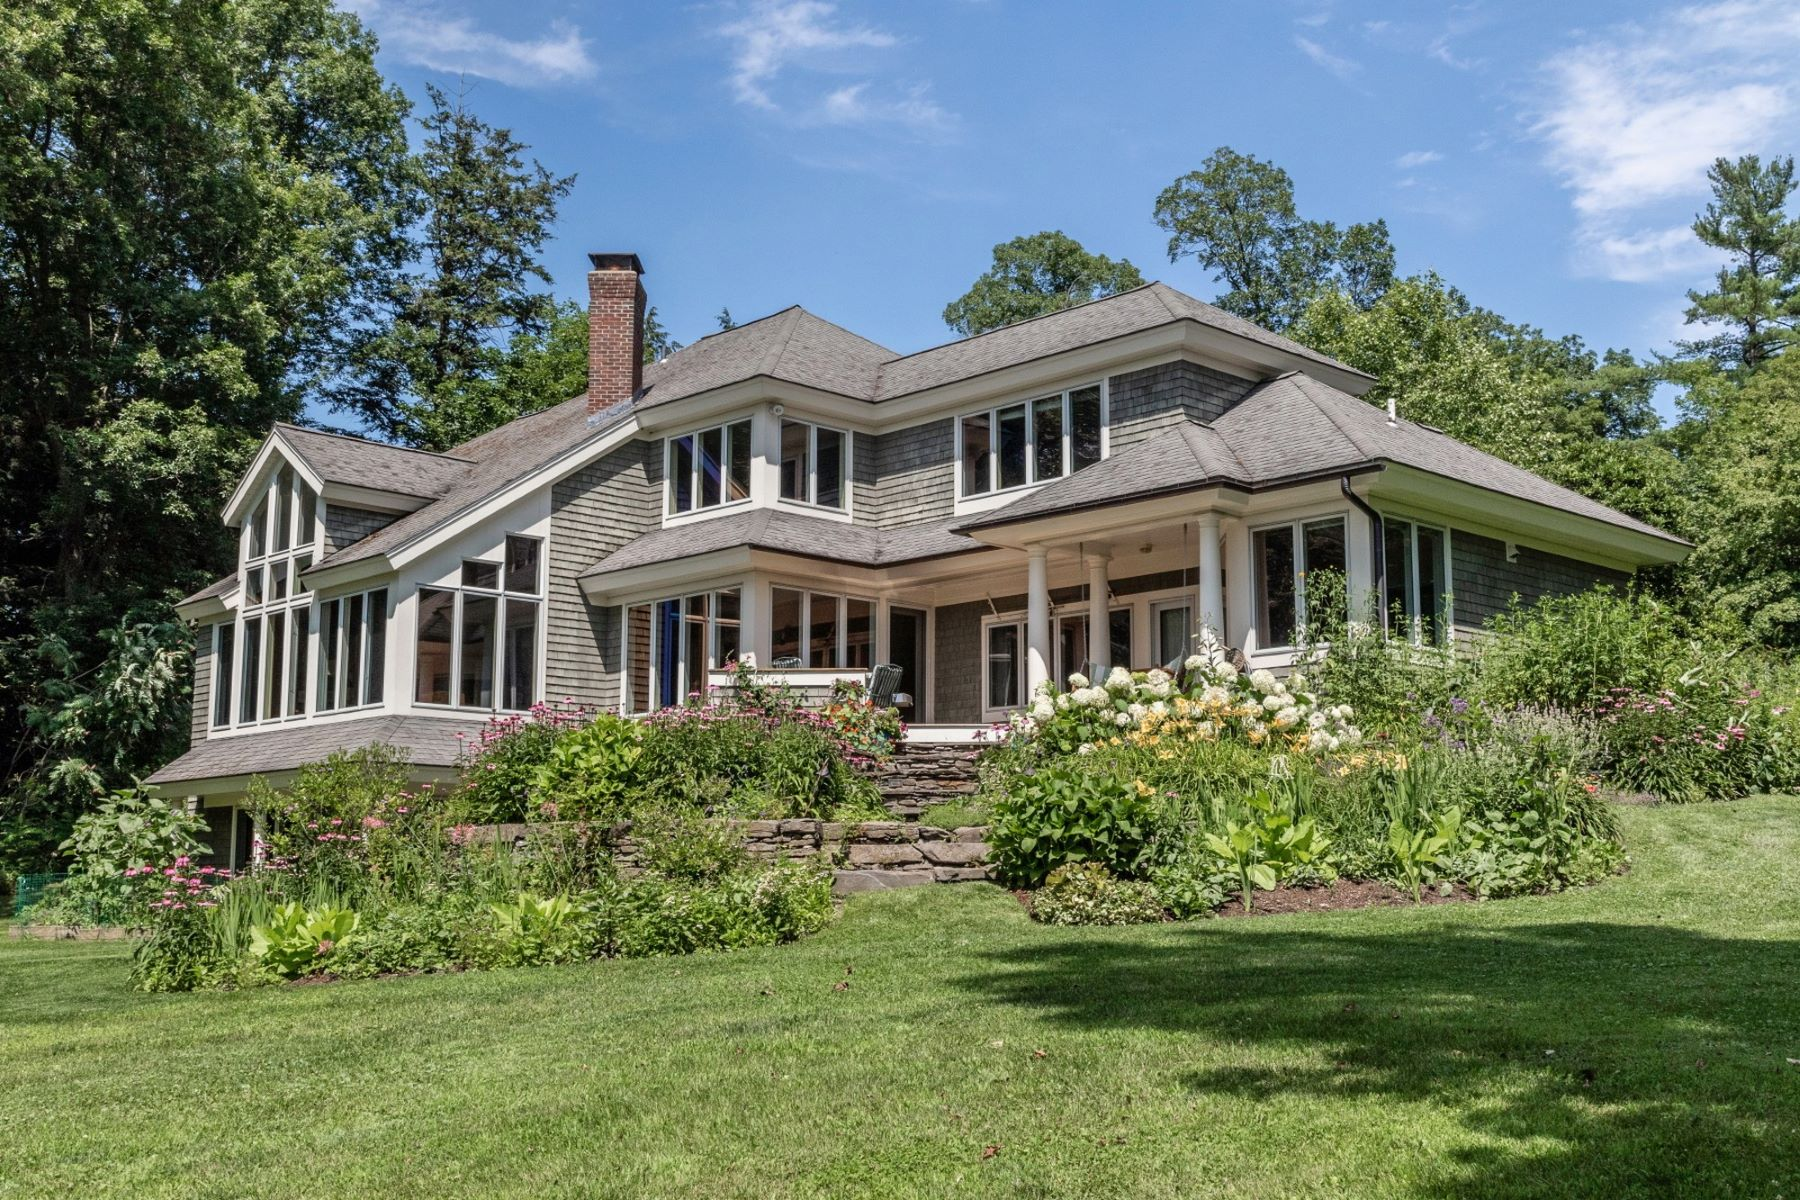 Single Family Homes für Verkauf beim Lakefront Contemporary Custom Home 269 Thorpe Cove Rd, Charlotte, Vermont 05445 Vereinigte Staaten